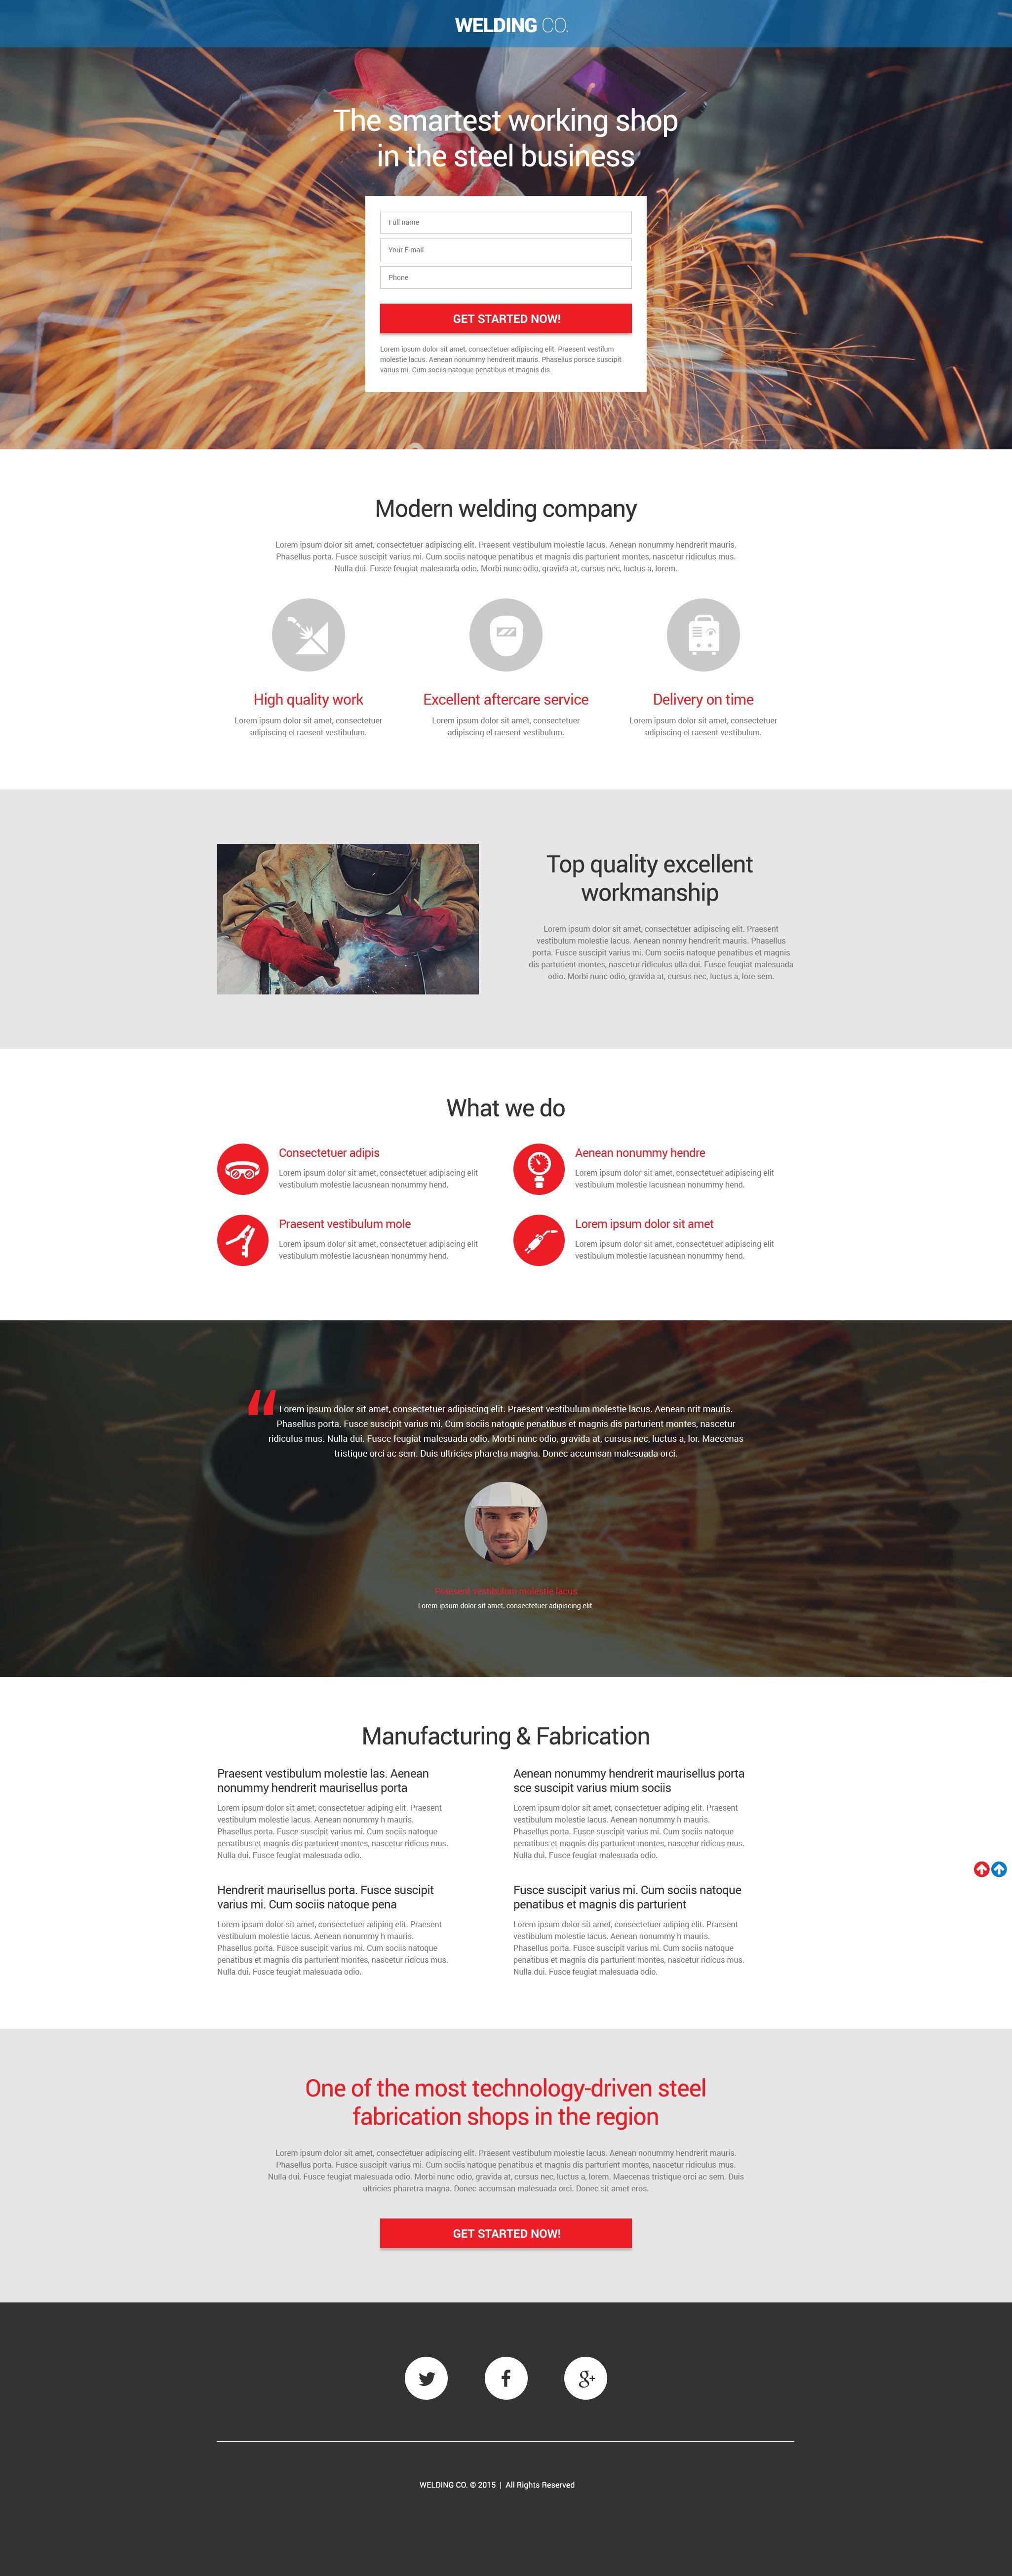 Welding Responsive Landing Page Template - screenshot